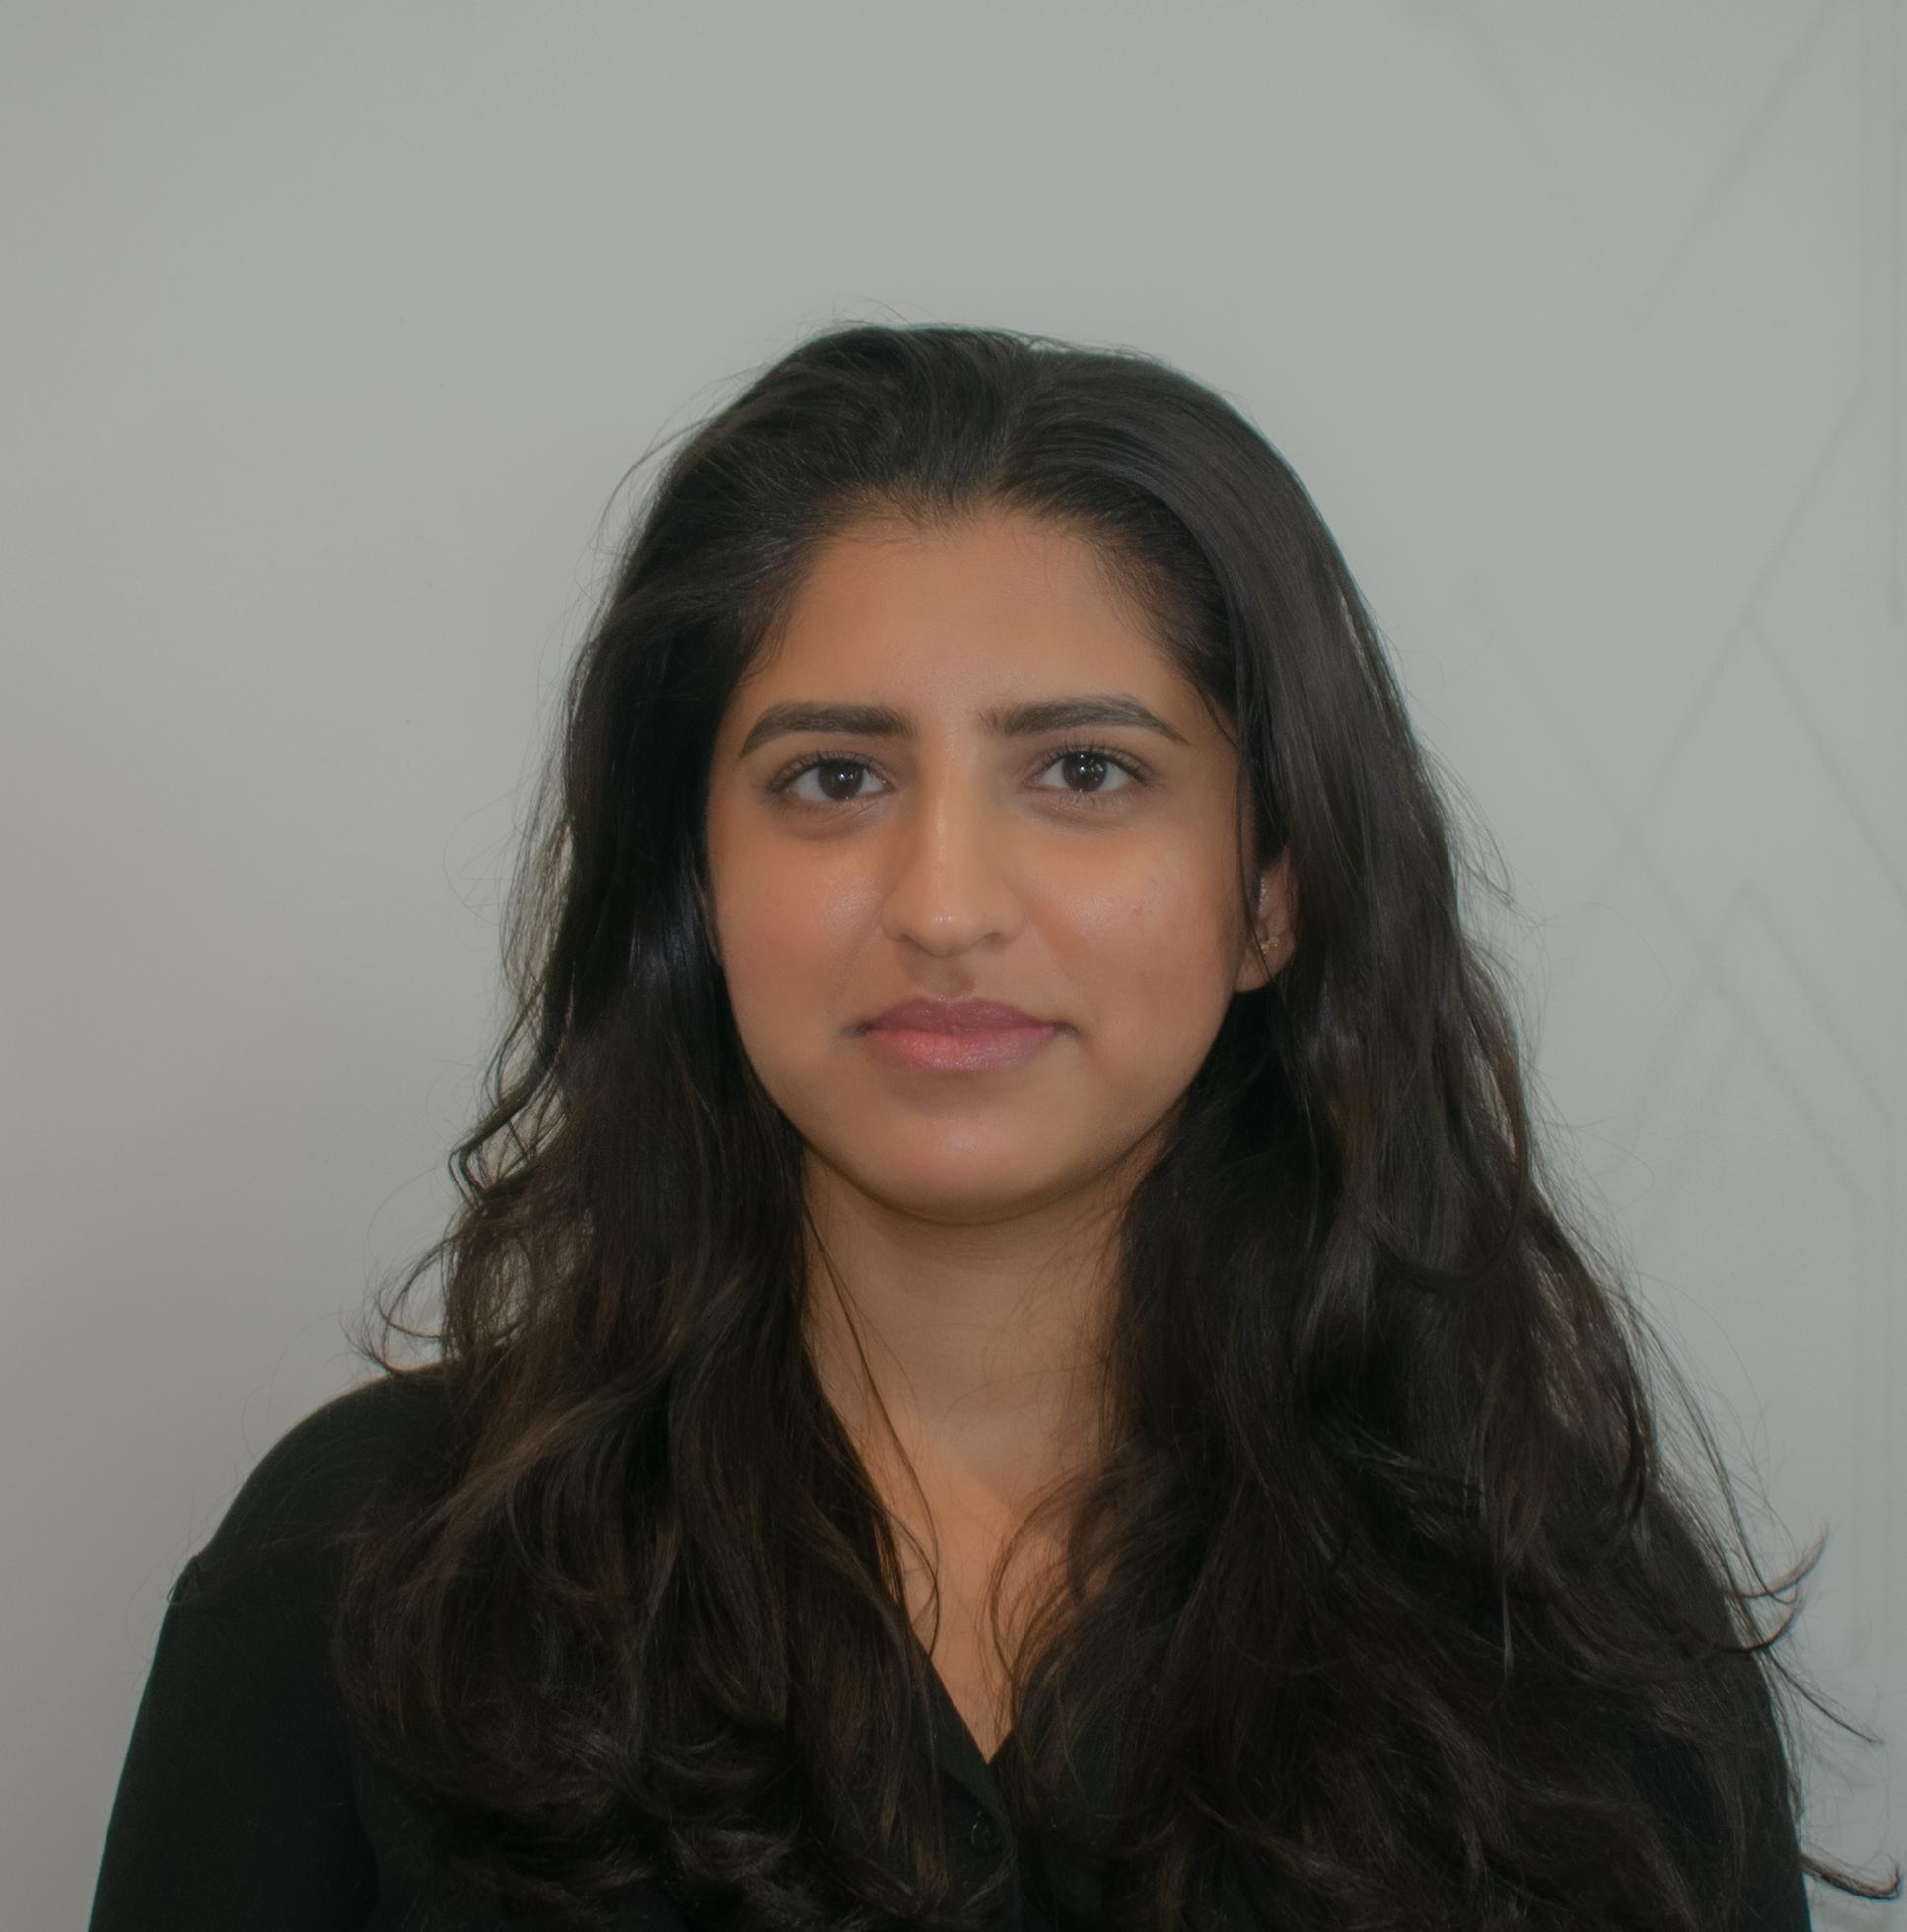 Zaahida Bandali